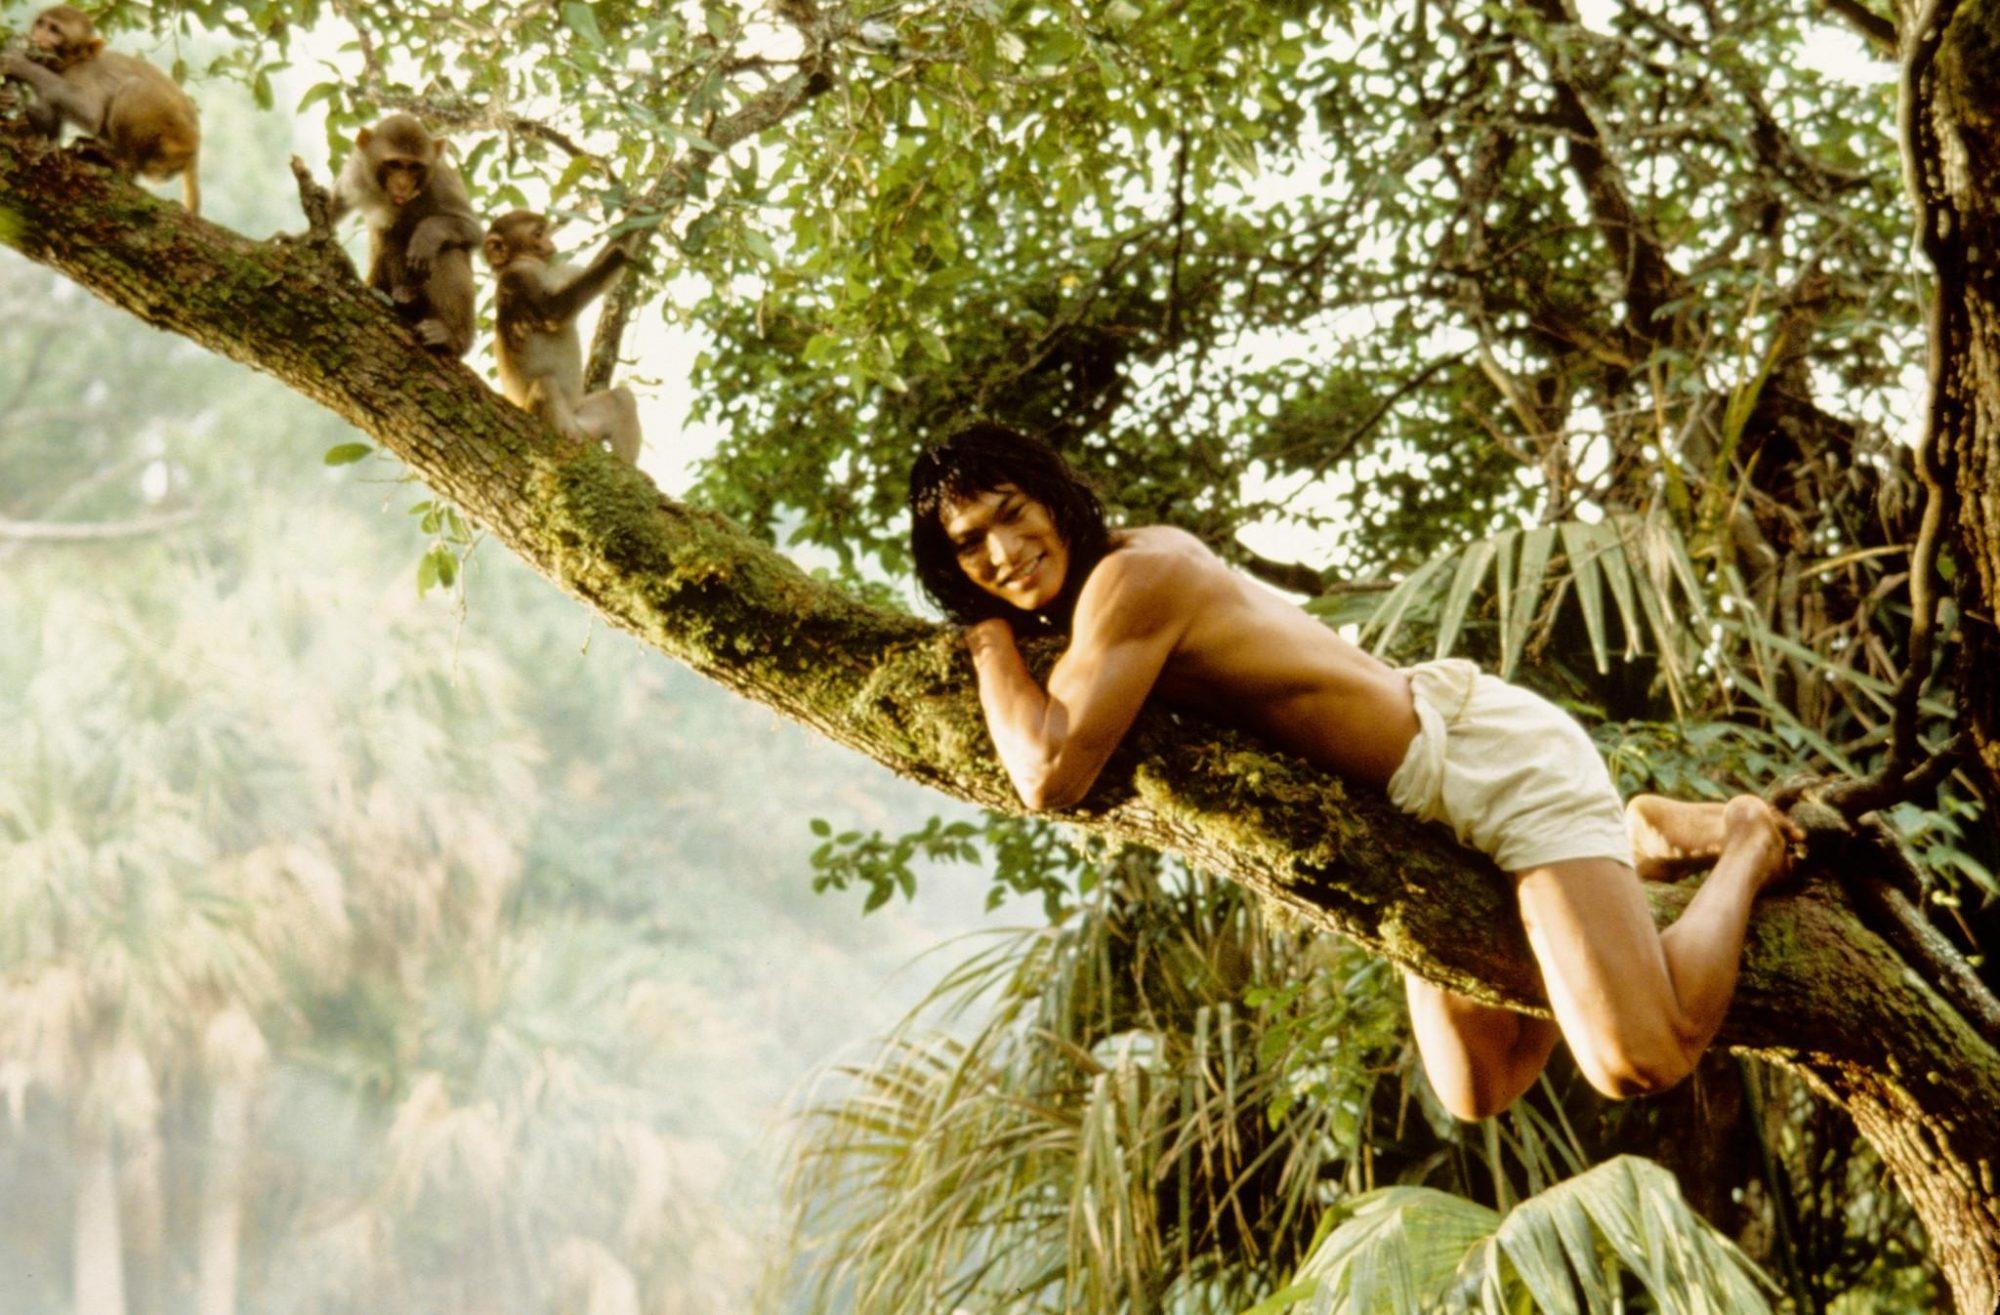 The-Jungle-Book-1994-image-the-jungle-book-1994-36224201-2048-1347.jpg